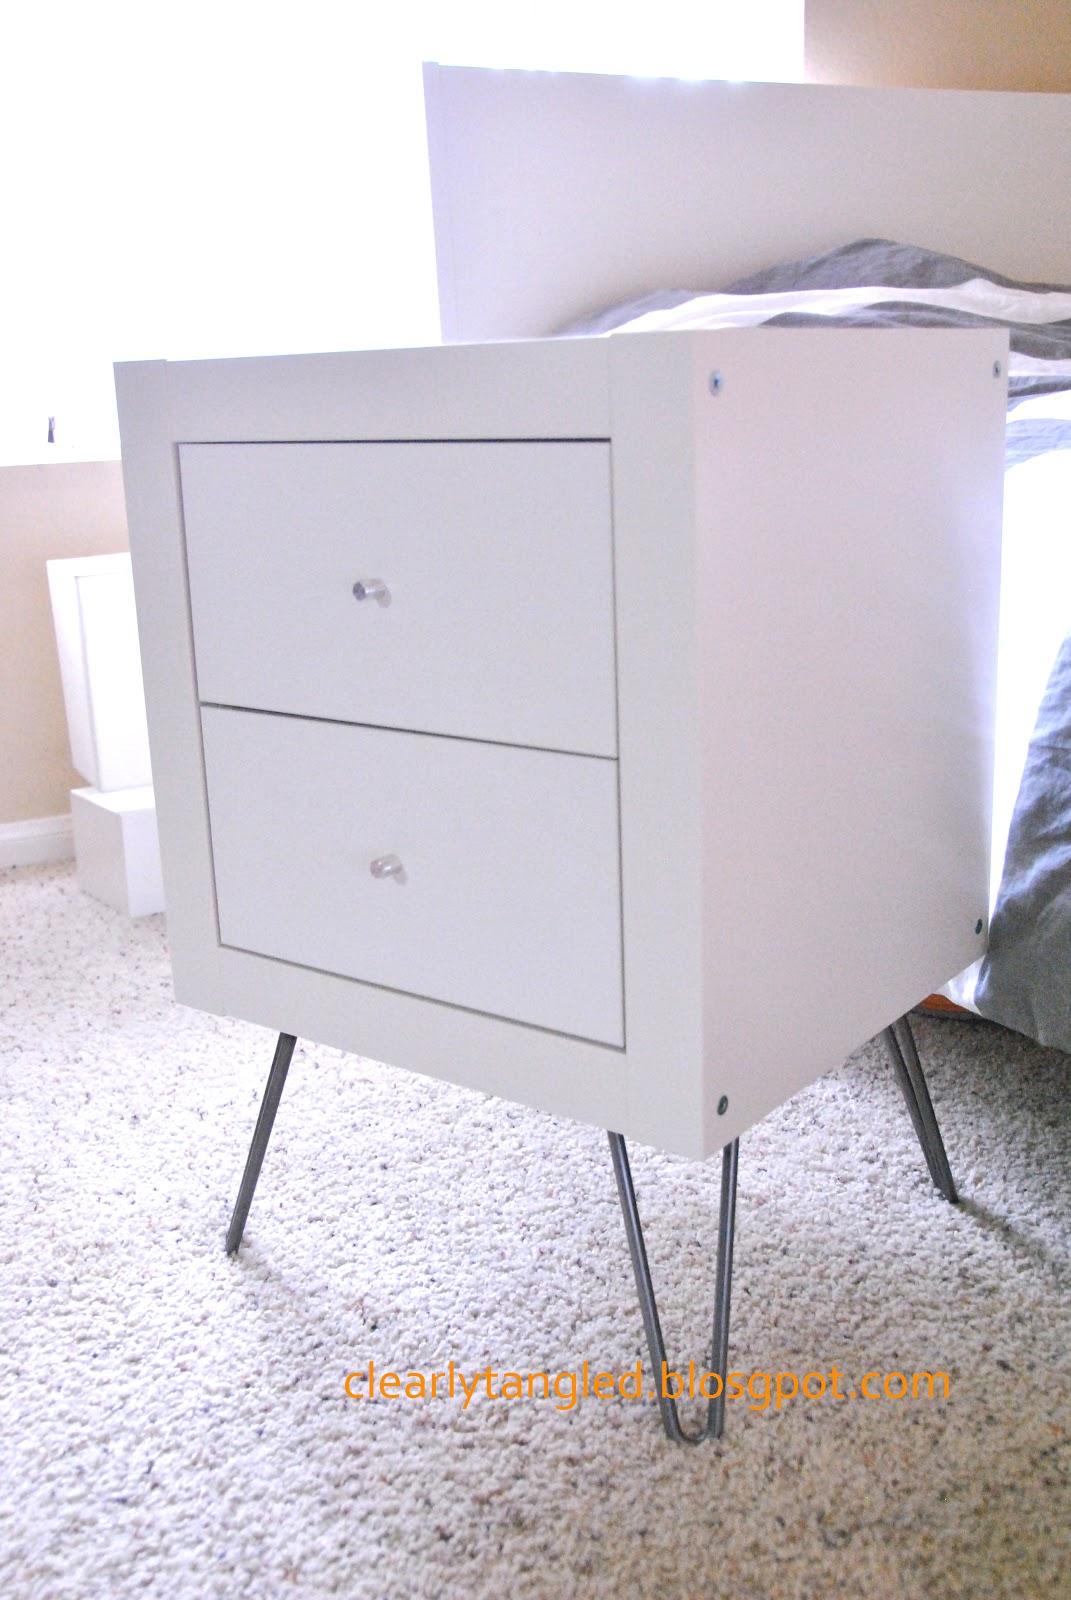 Clearlytangled Ikea Expedit Wall Shelf Nightstand